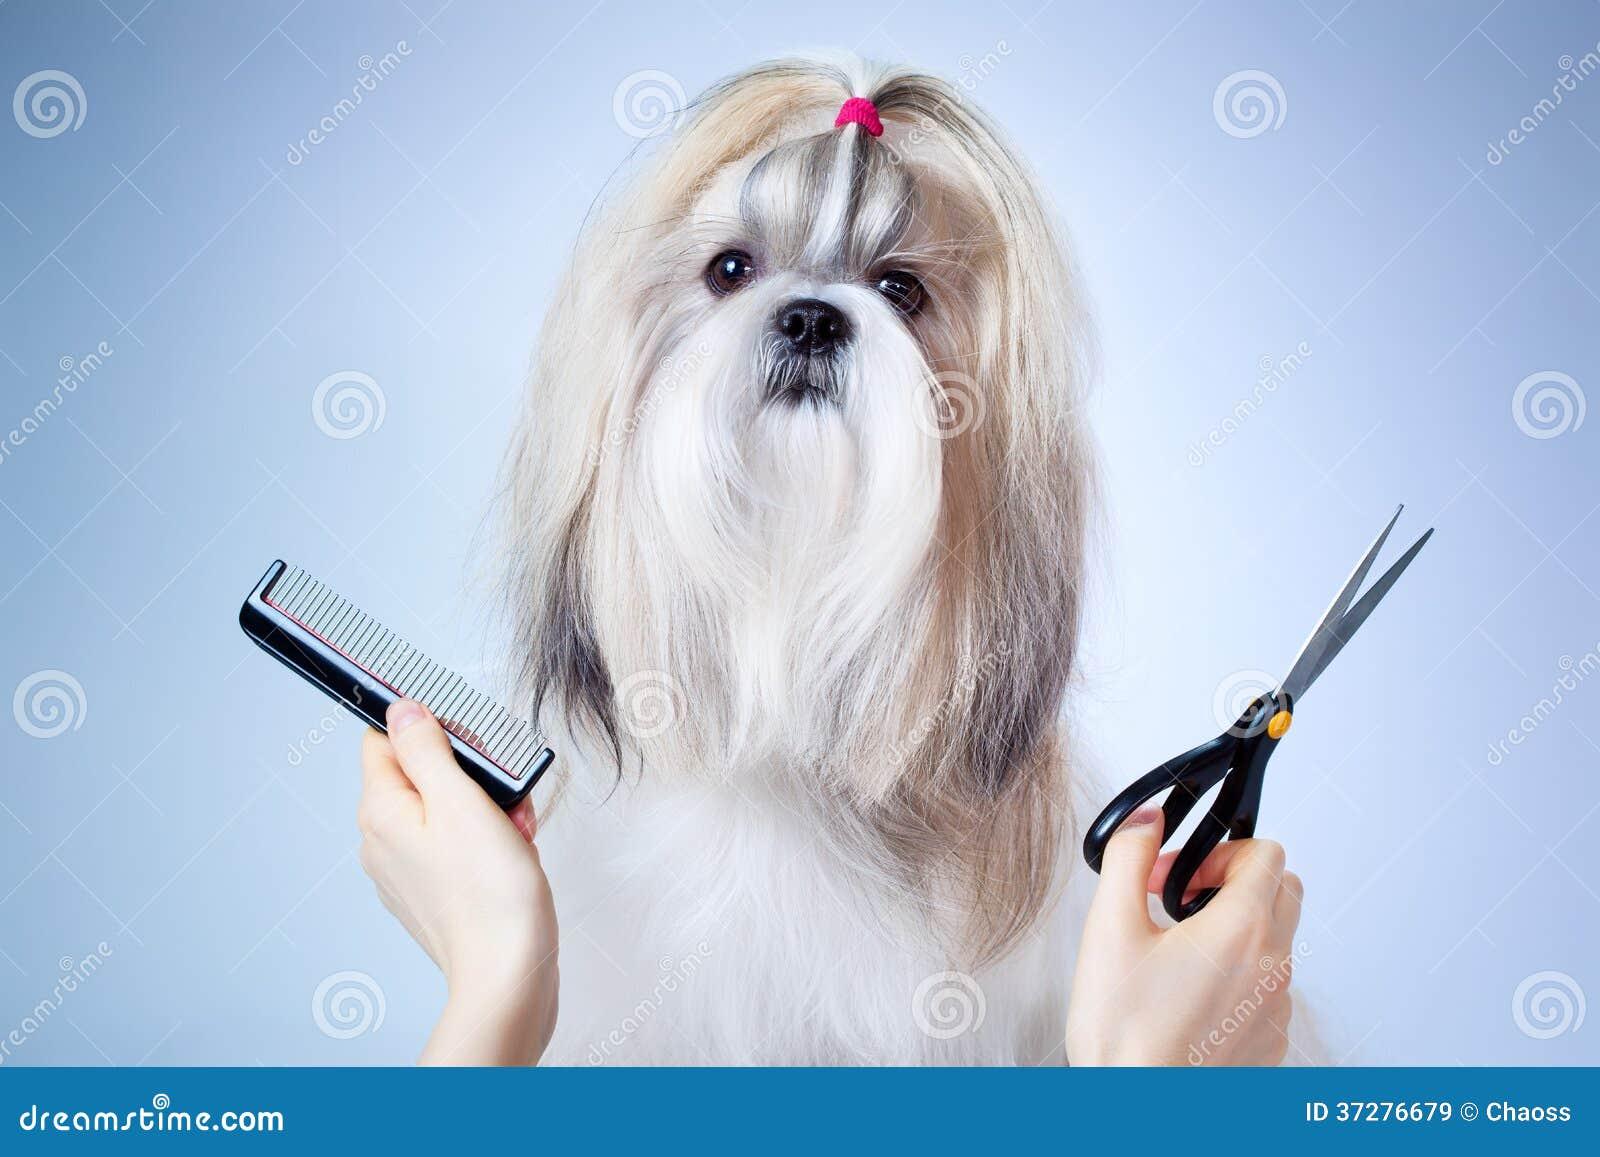 Shih Tzu Dog Grooming Stock Image Image Of Shih Shihtzu 37276679